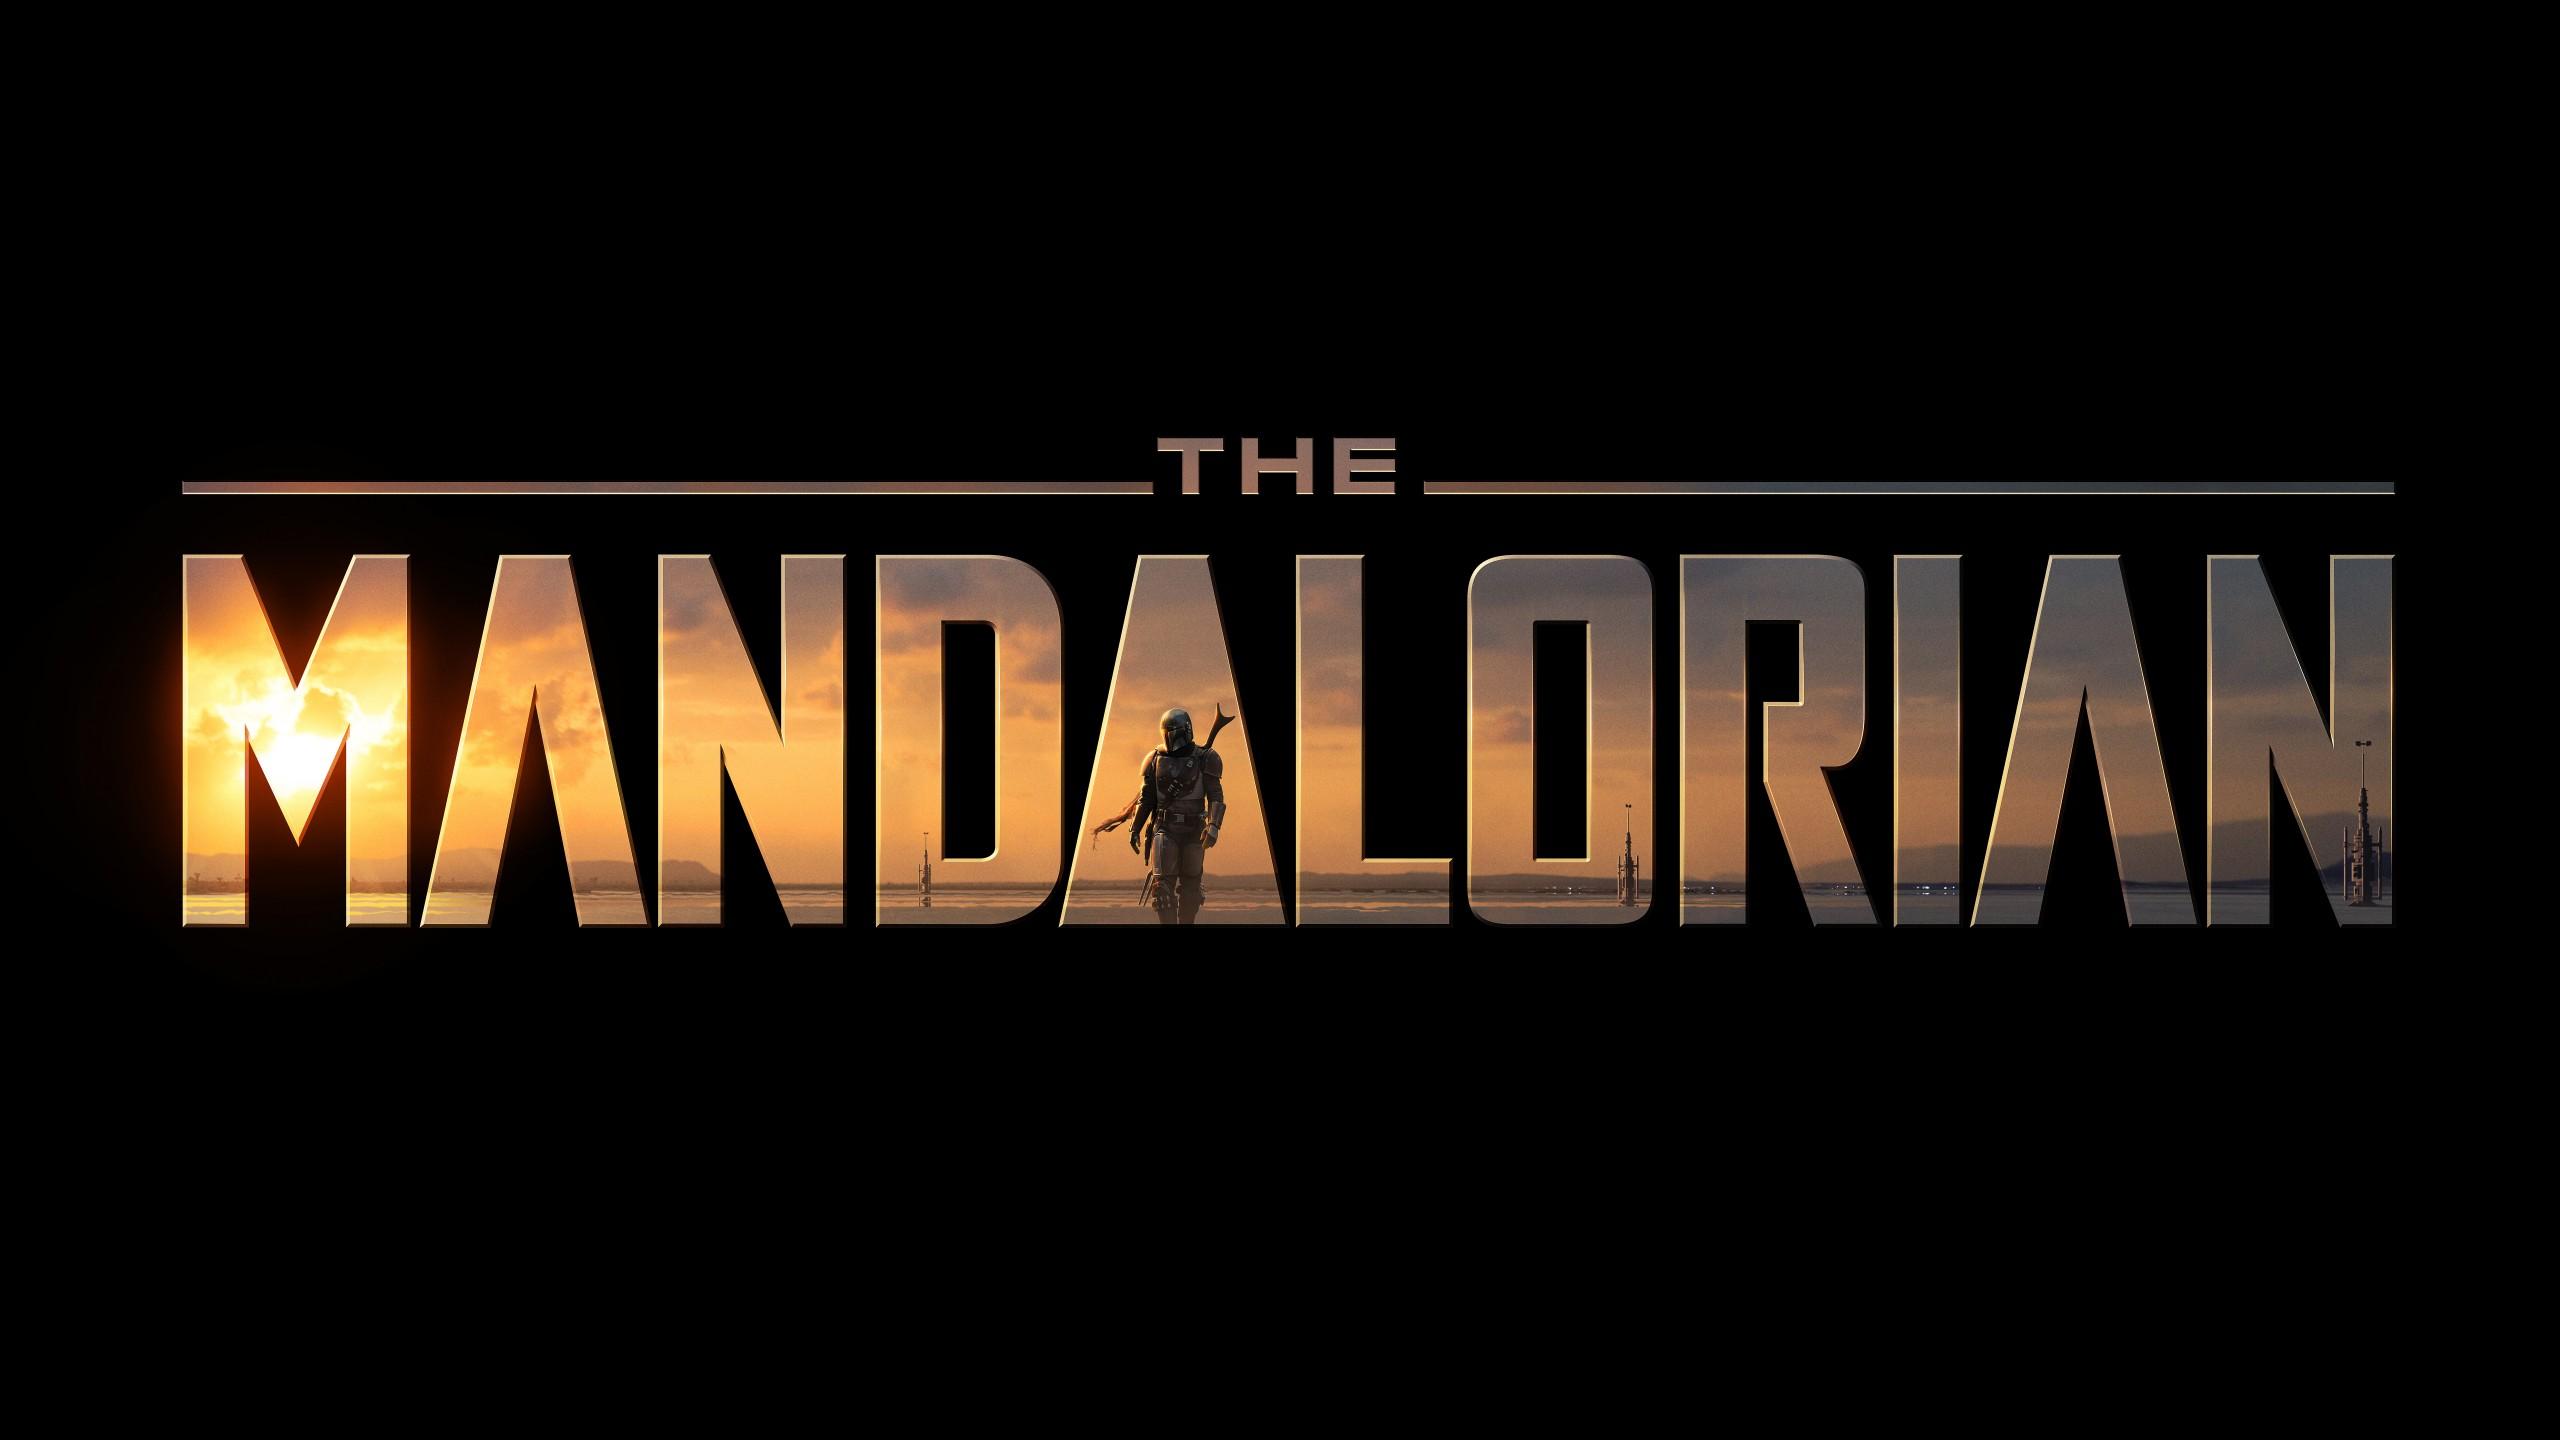 Star Wars Wallpaper Iphone X The Mandalorian Tv Series 2019 4k 8k Wallpapers Hd